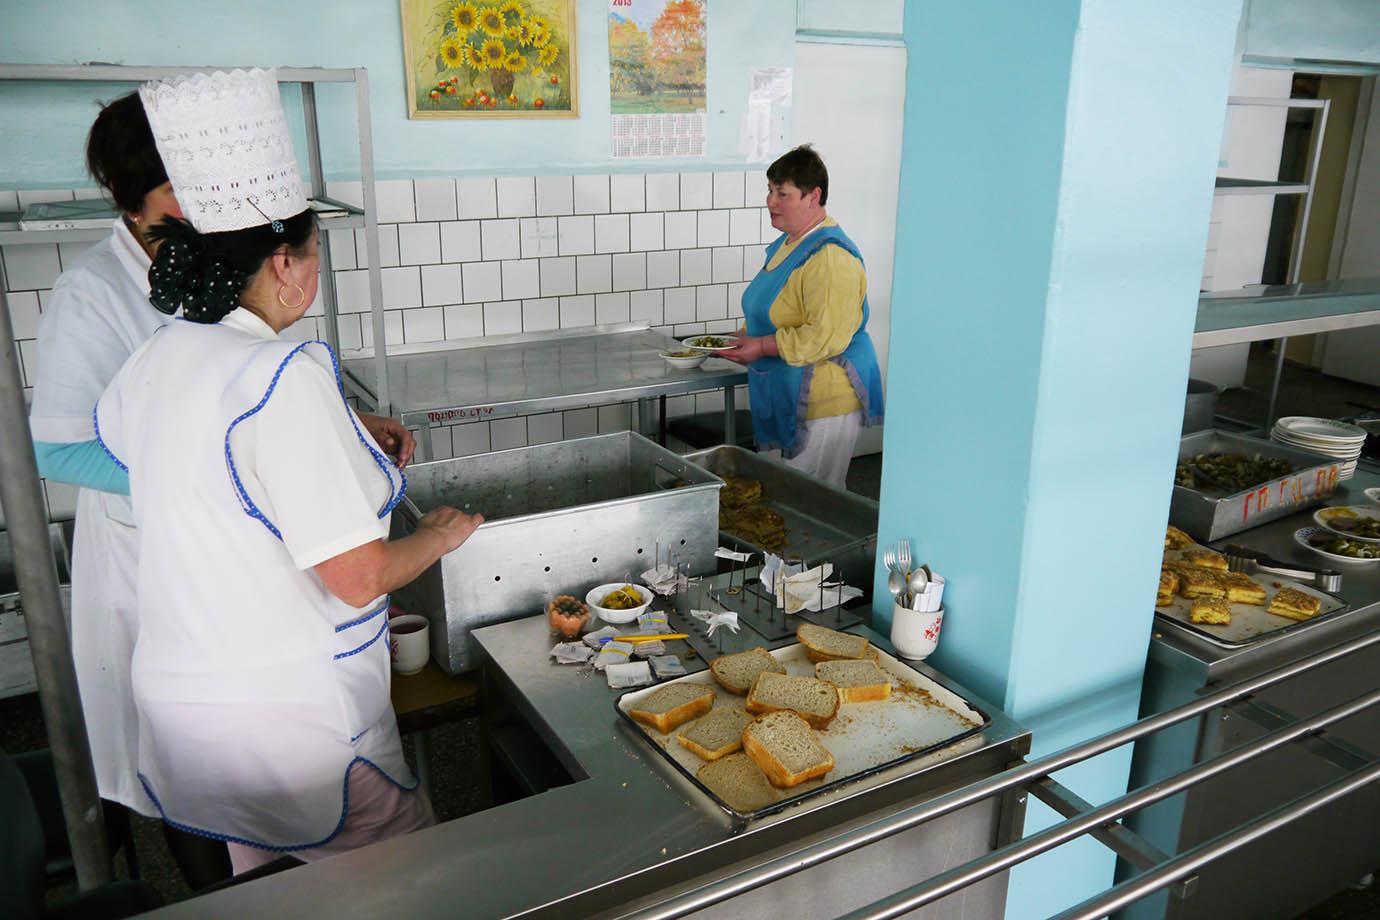 chernobyl-cafeteria12